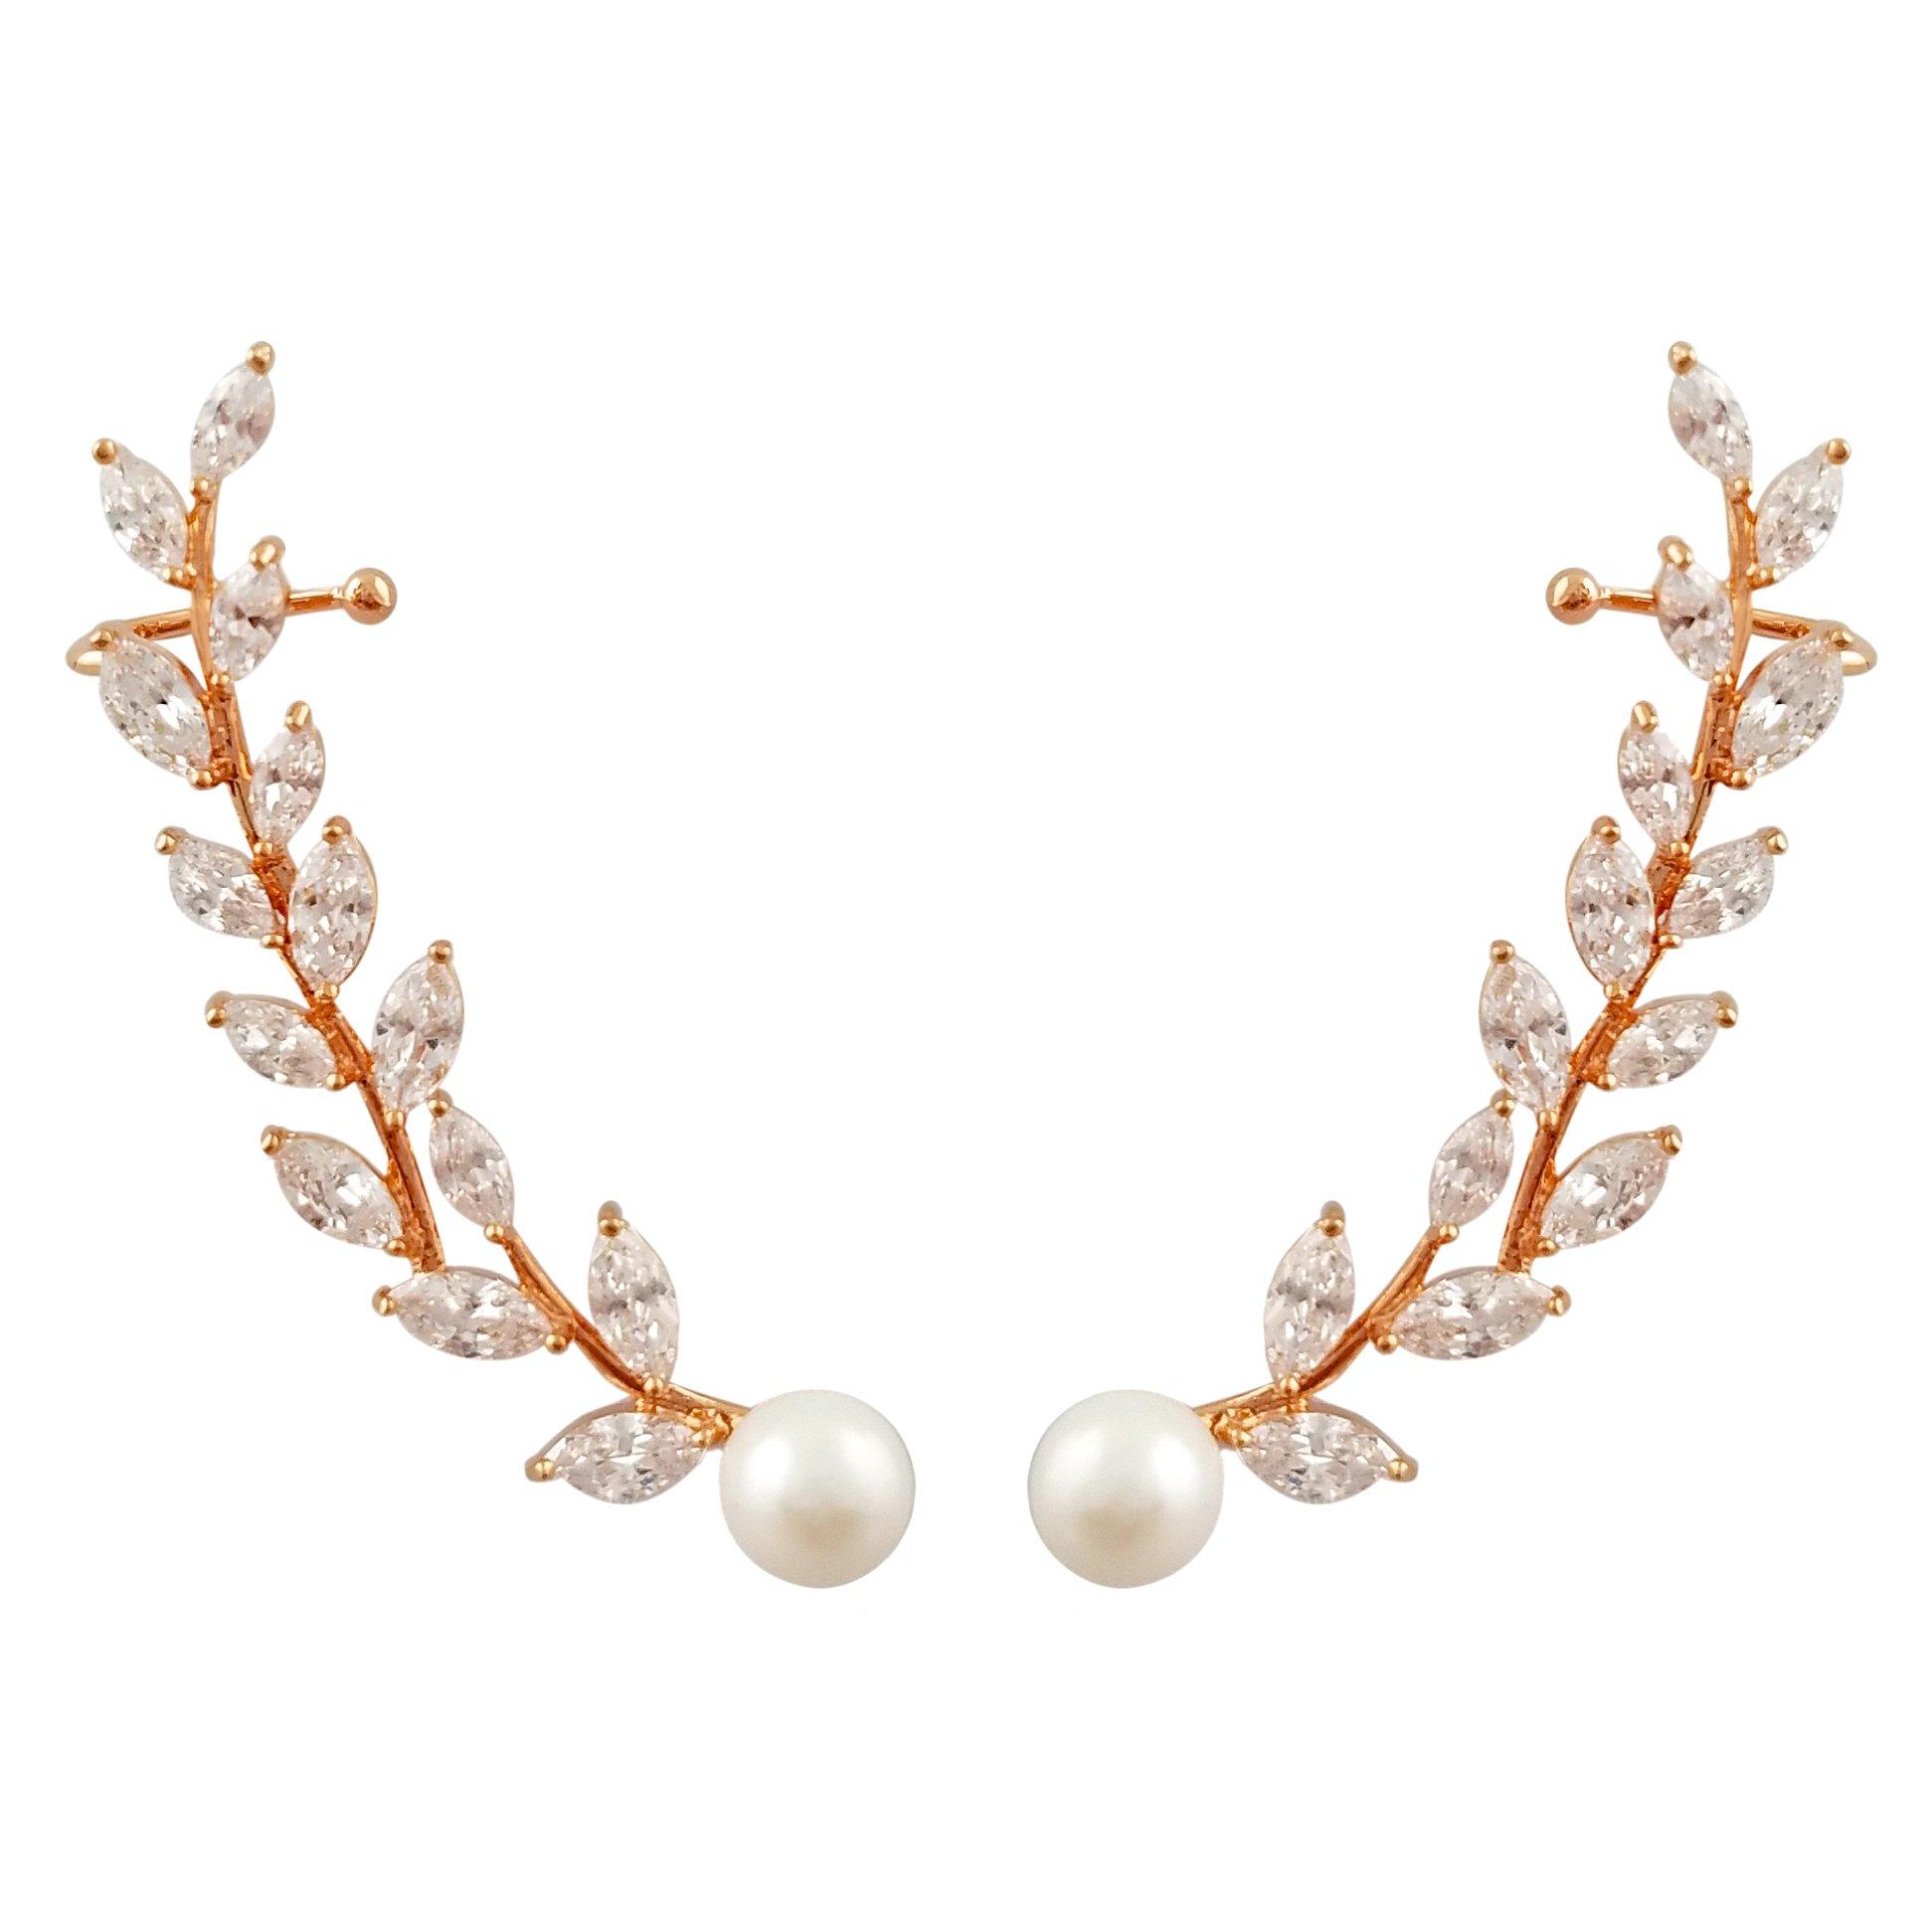 SELOVO Women's Simulated Pearl Zircon Cuff Crawlers Ear Wrap Earrings Rose Gold Tone